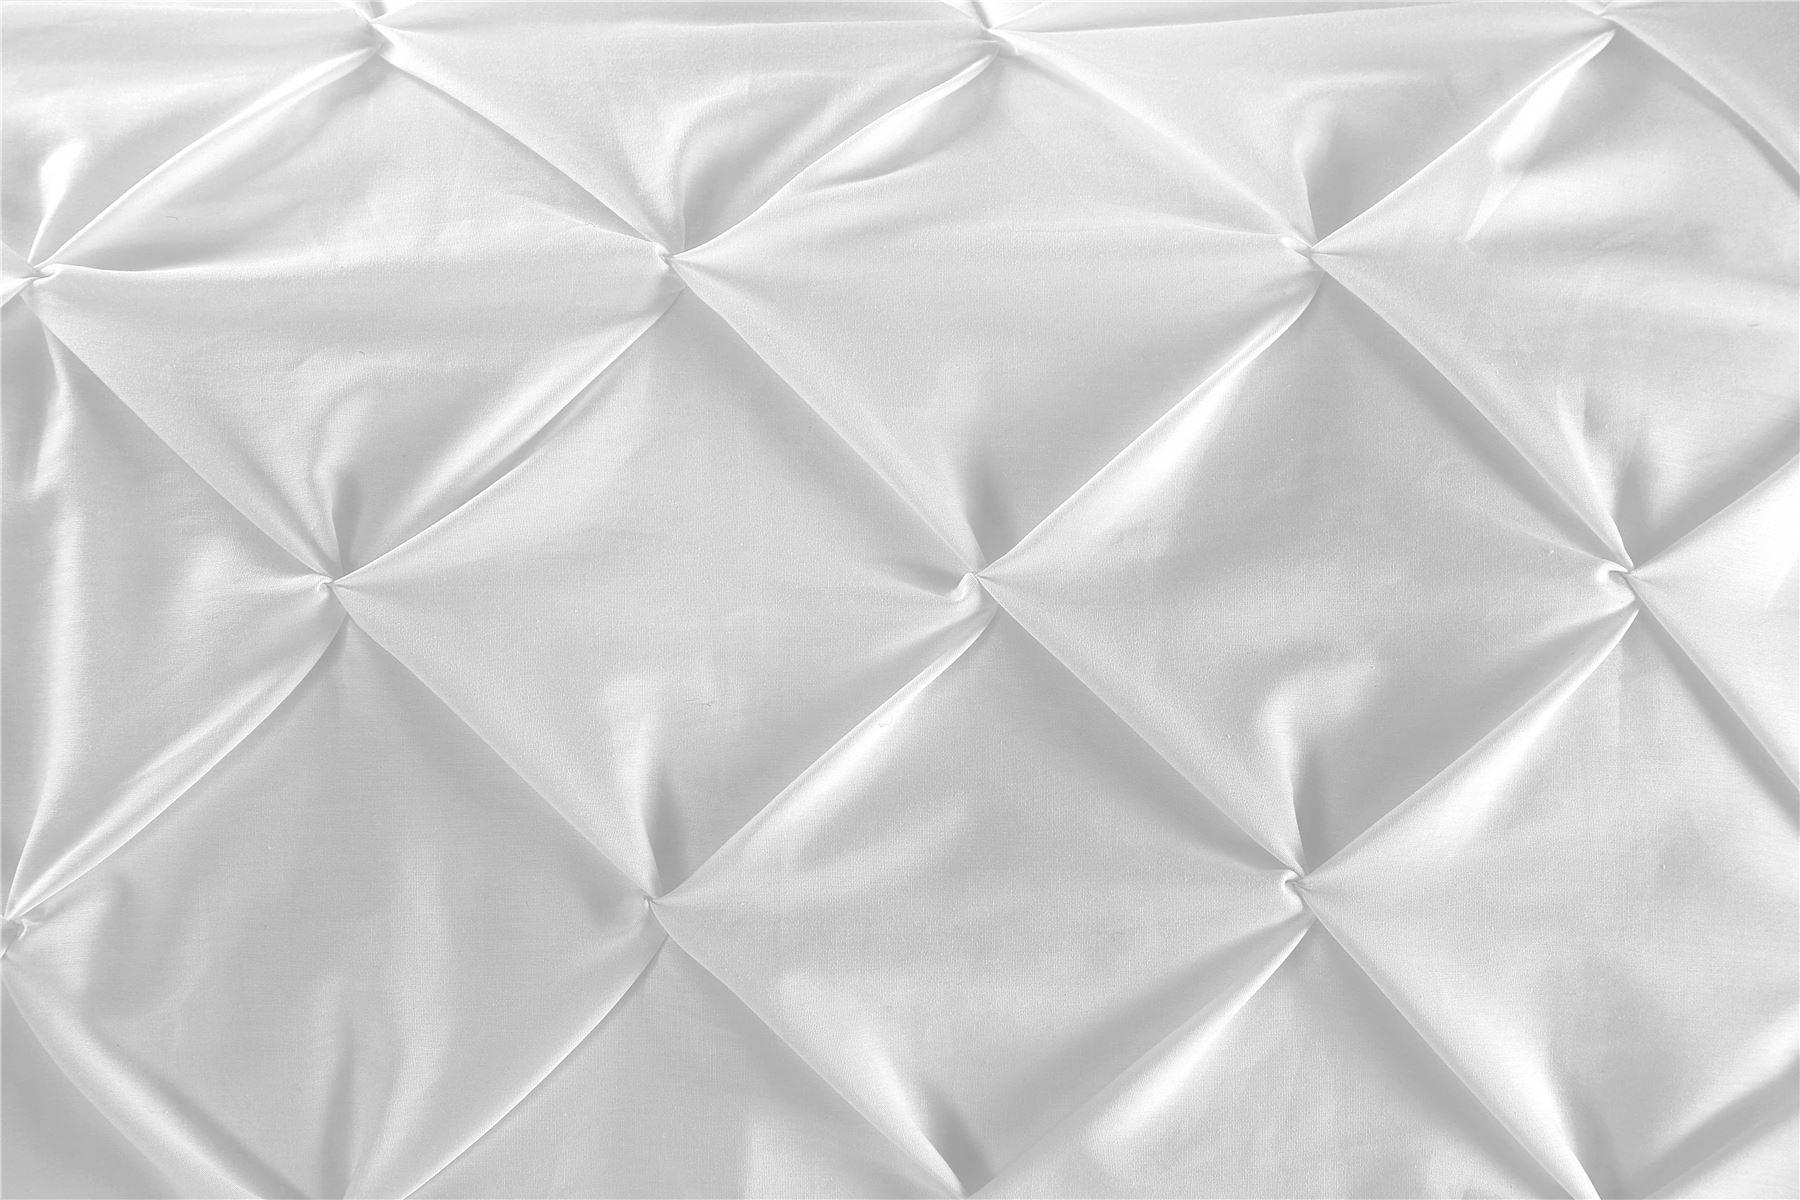 Luxury-Pure-100-Cotton-200-Thread-Pinch-Pleat-Pintuck-Puckering-Duvet-Cover-Set thumbnail 46